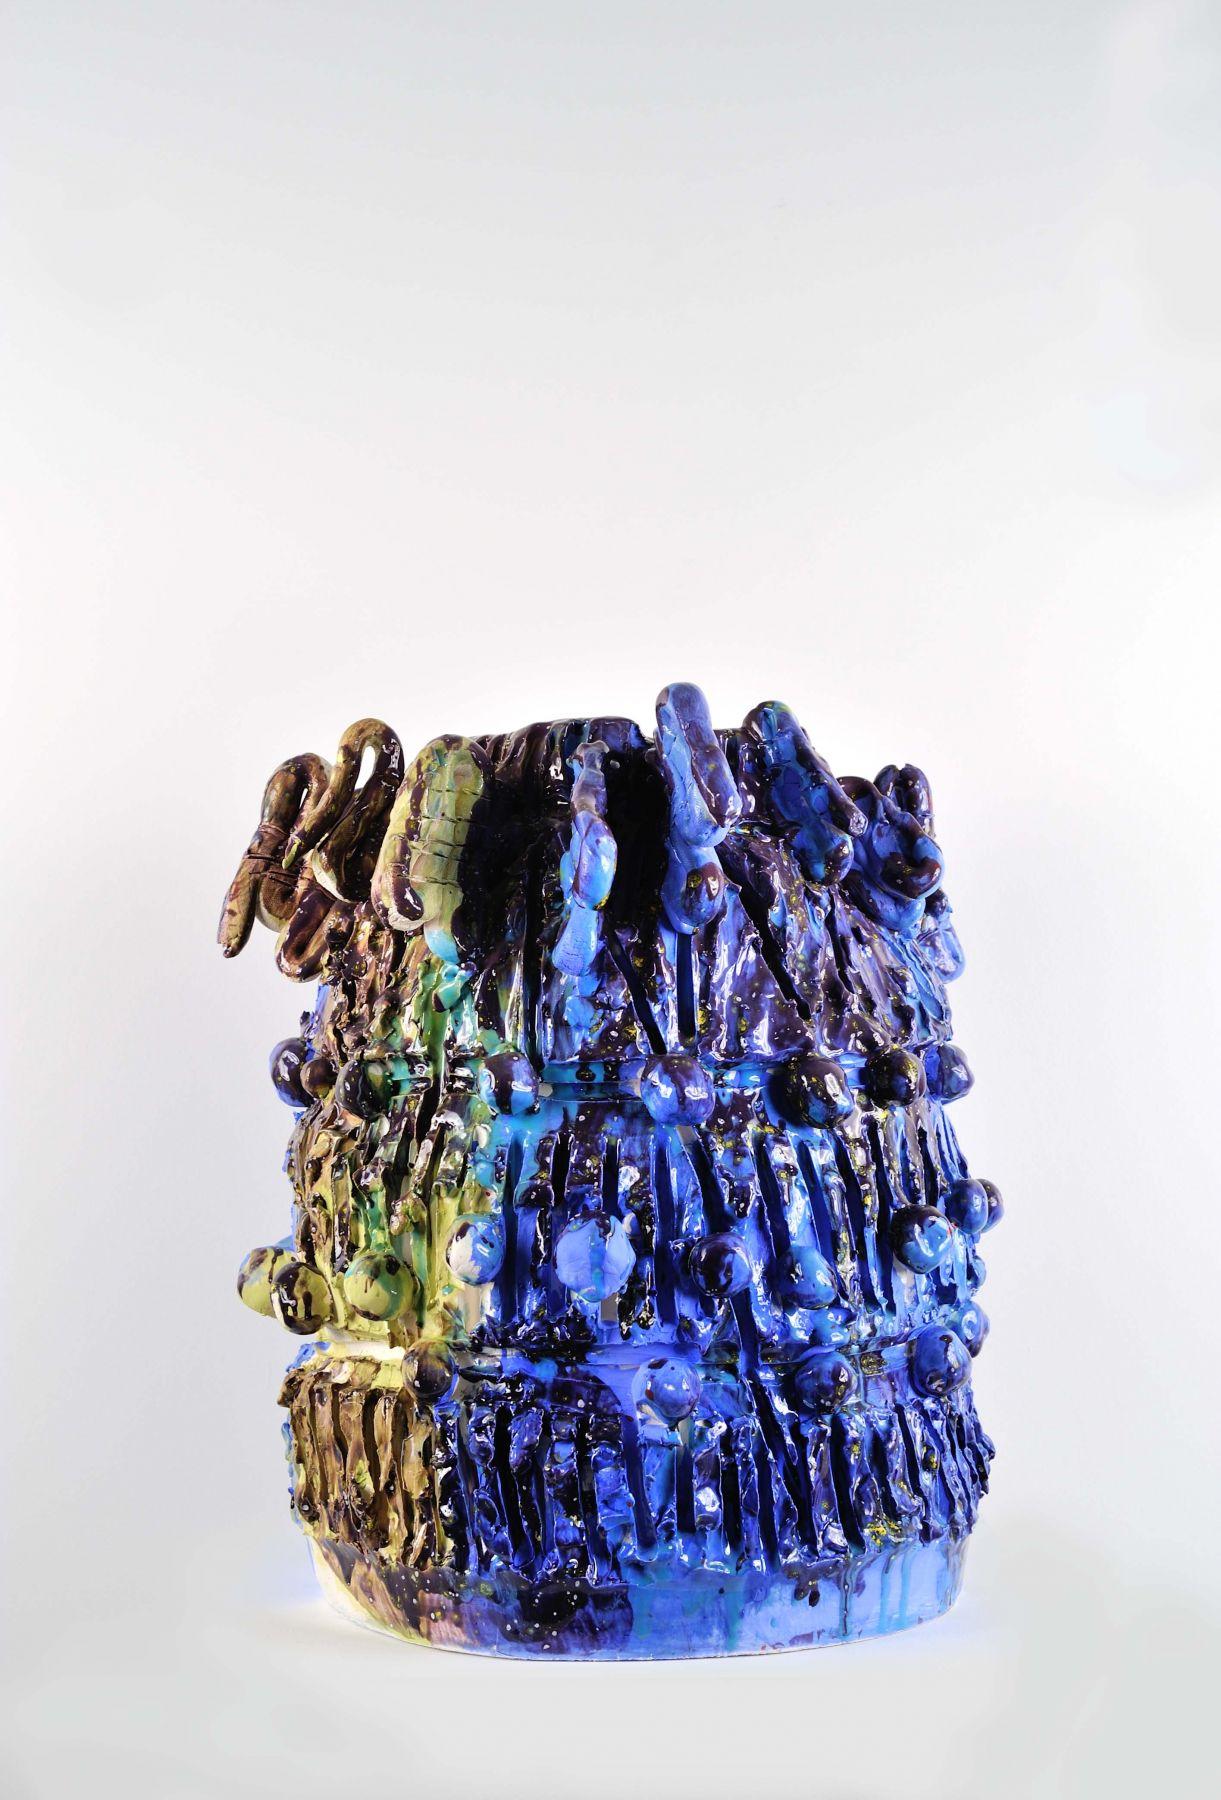 a glazed ceramic sculpture by william j. o'brien, an established contemporary art who makes ceramics